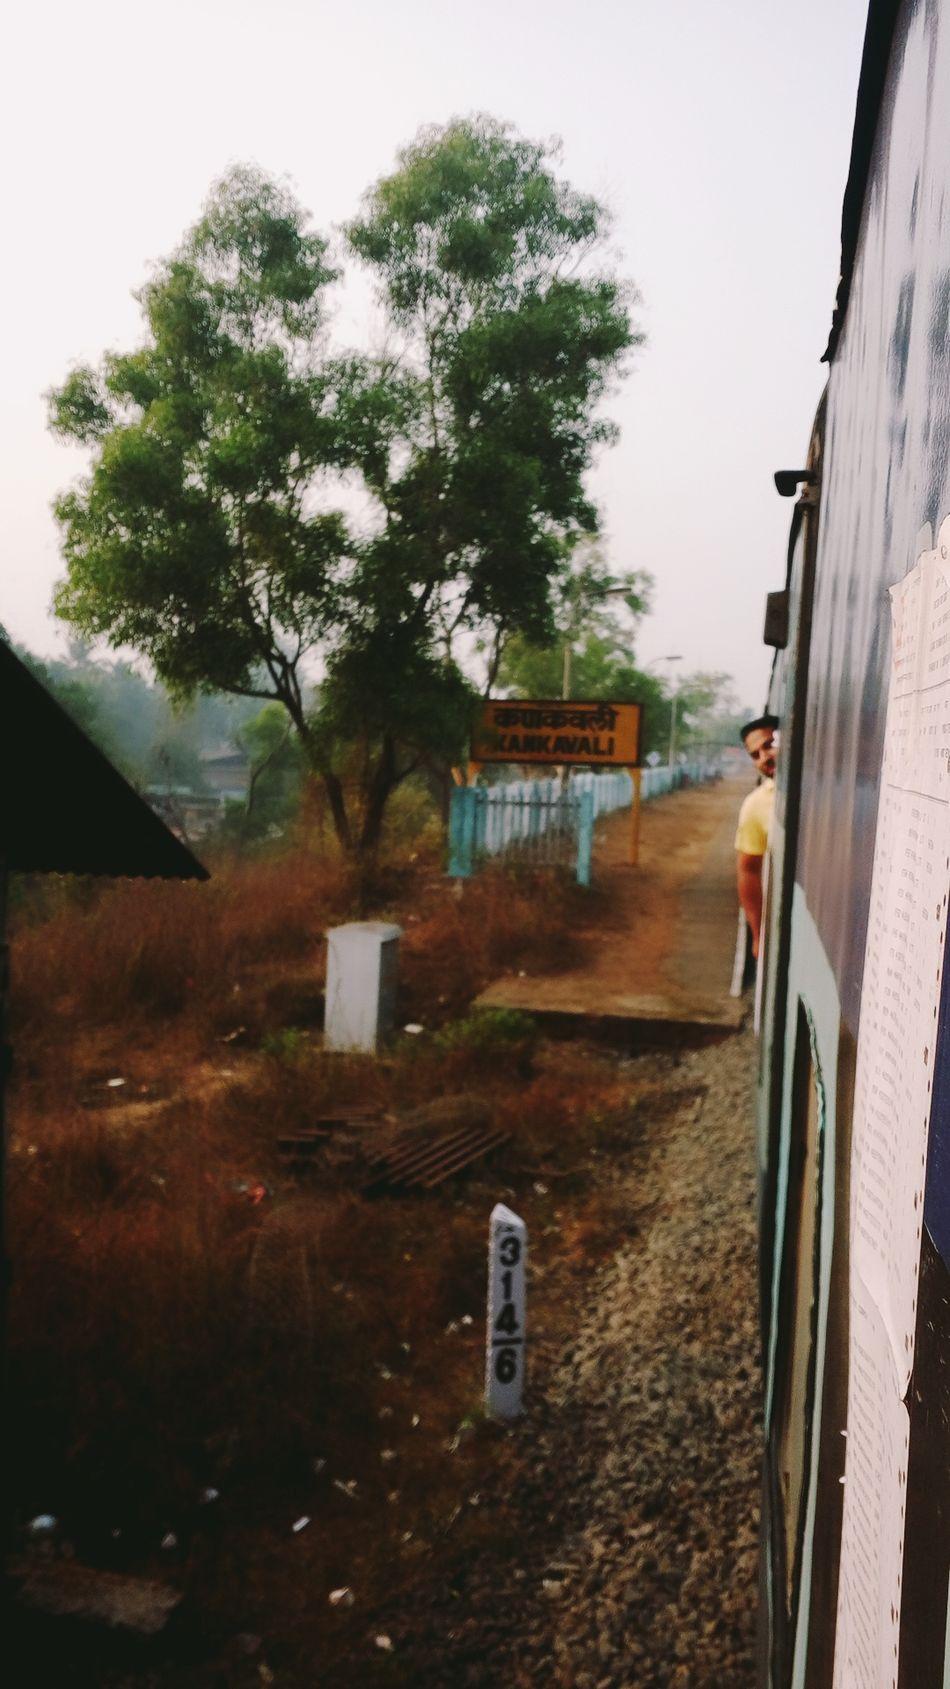 Indianrailways Konkanrailways Konkandiaries Rail Transportation Departing Tree Outdoors Netravatiexpress